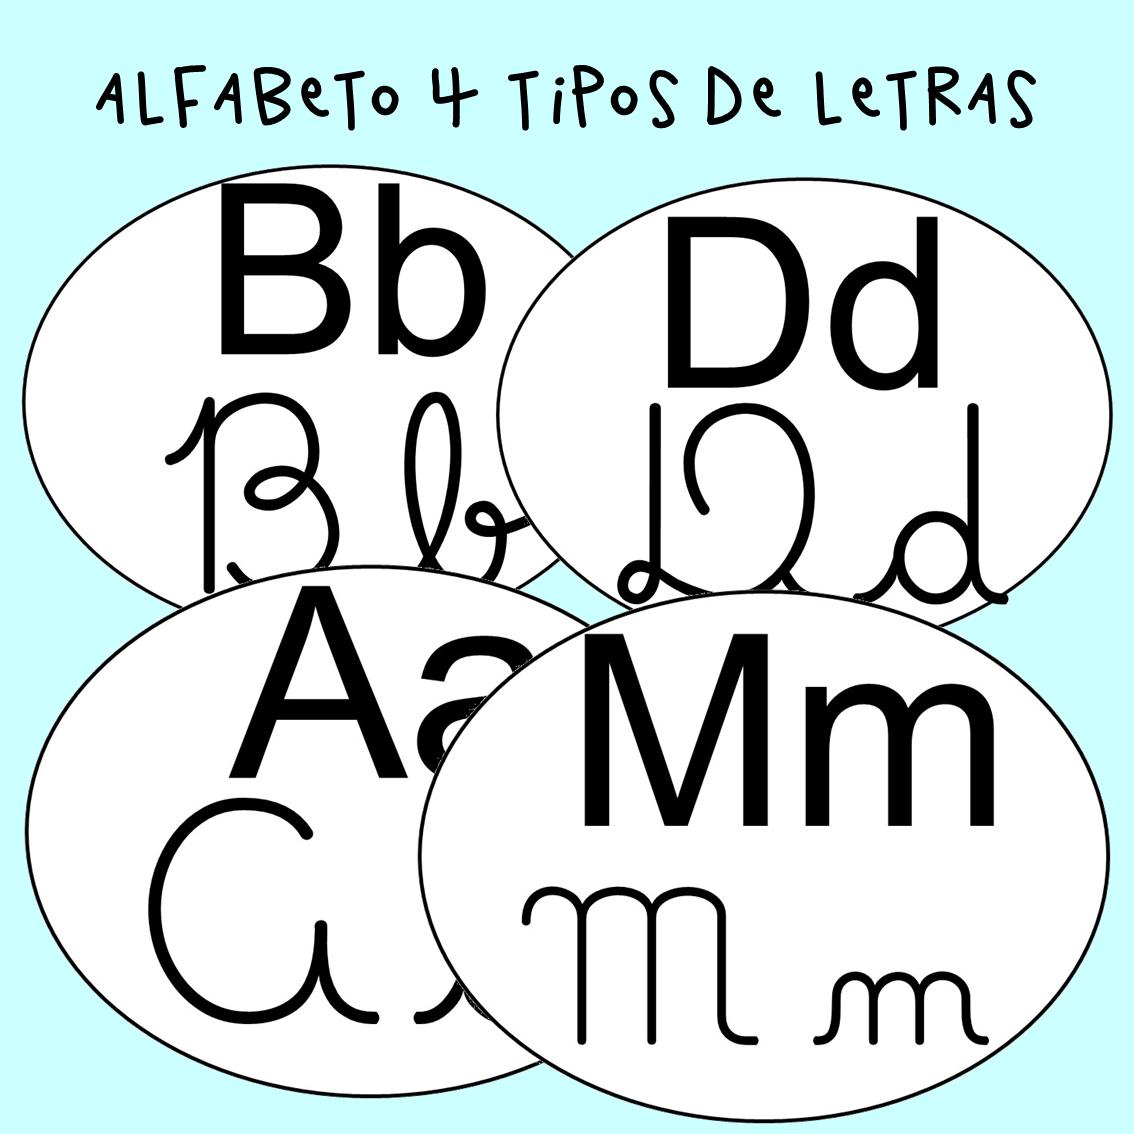 Alfabeto com 4 tipos de letras – Tags para alfabeto de parede